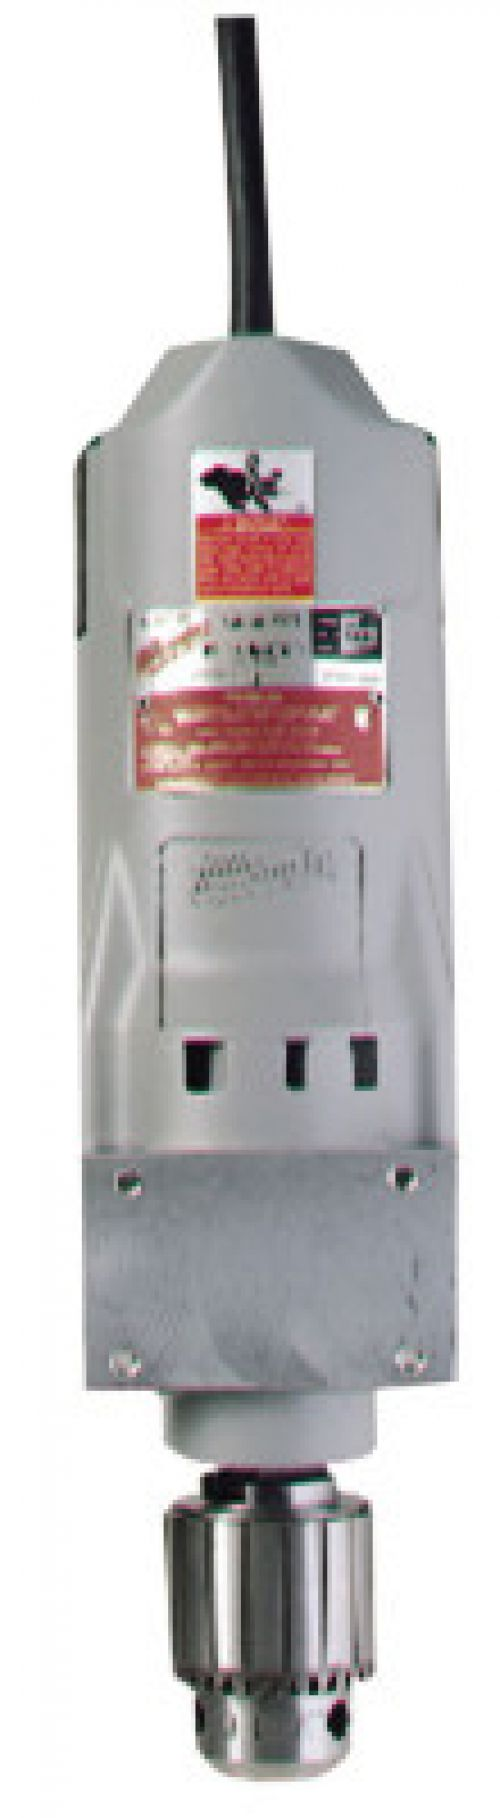 MILWAUKEE ELECTRIC TOOLS Drill Motors, 600 rpm, 1/2 in Cut Cap., Chuck